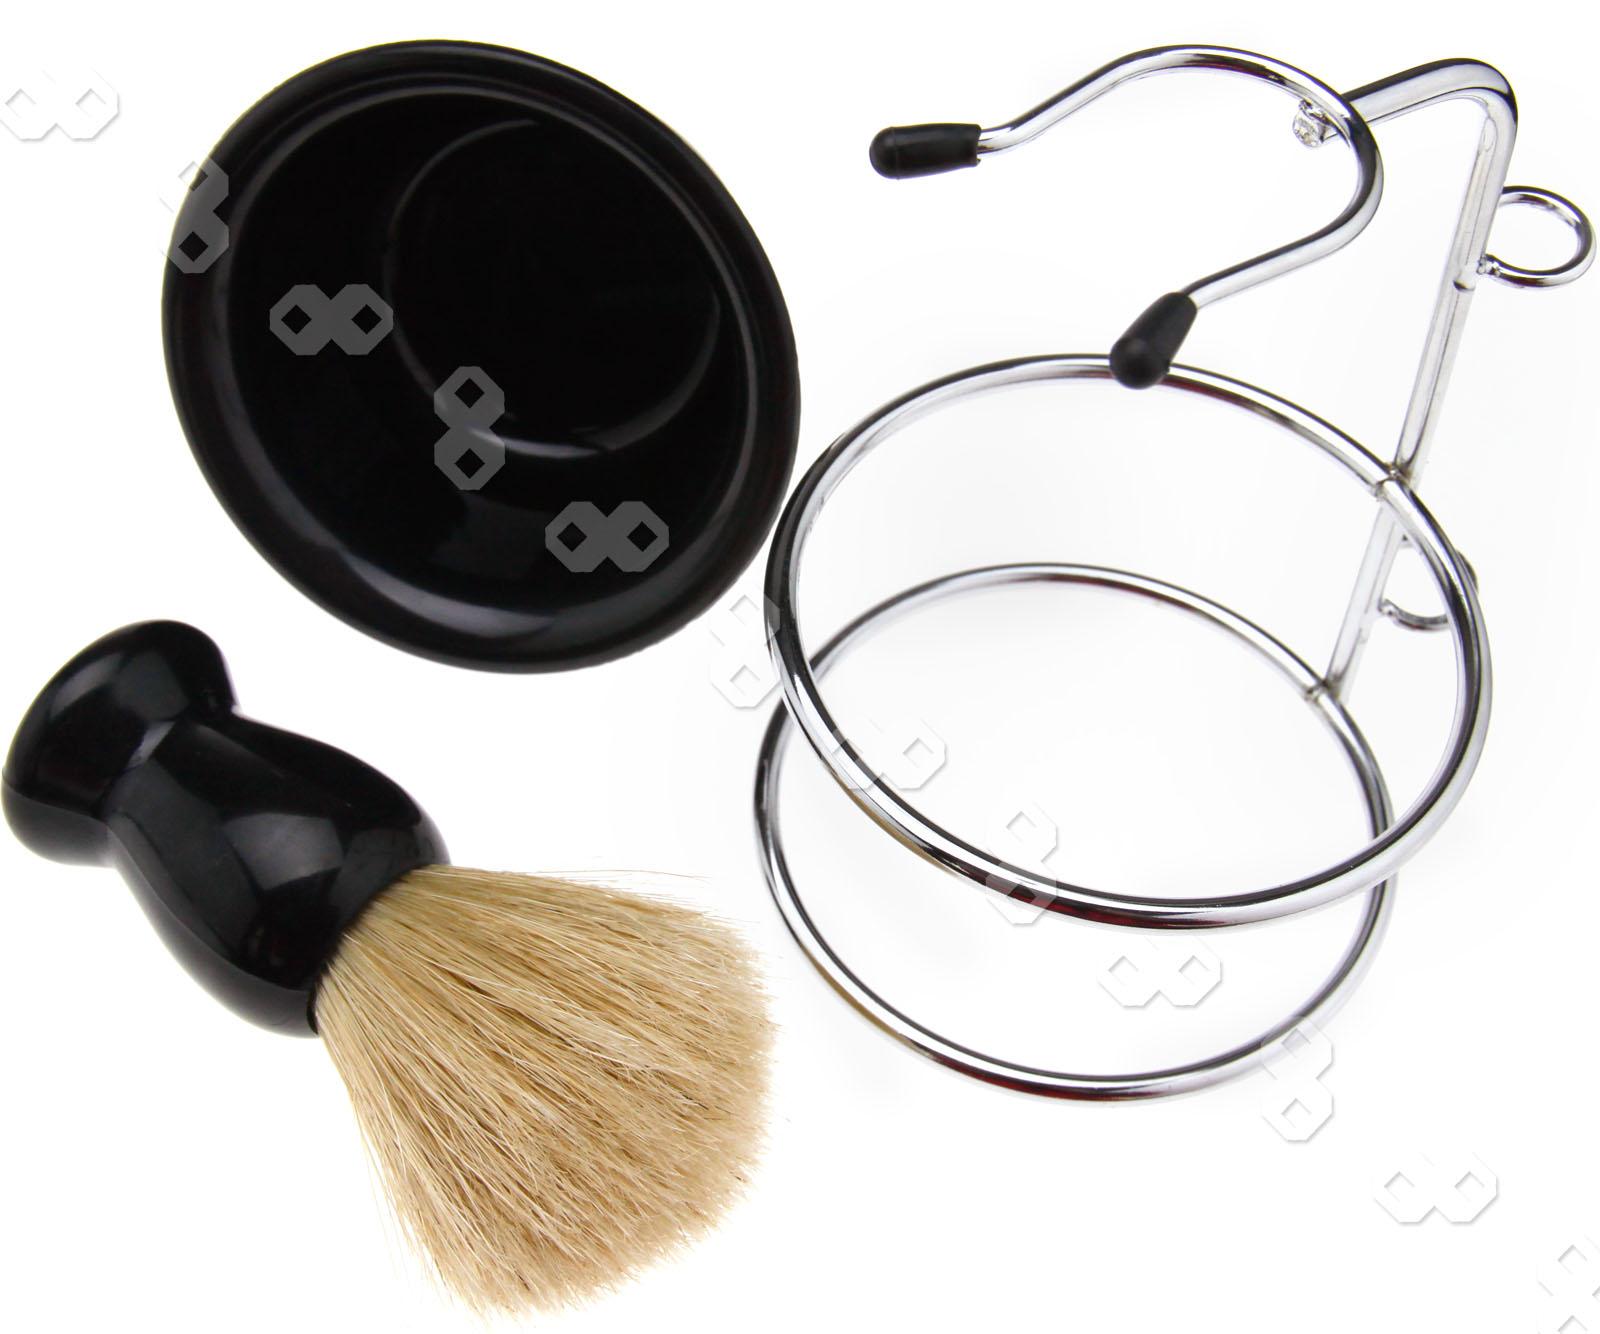 men shaving razor beard clean kit brush soap bowl stand razor blades 4 in 1 ebay. Black Bedroom Furniture Sets. Home Design Ideas